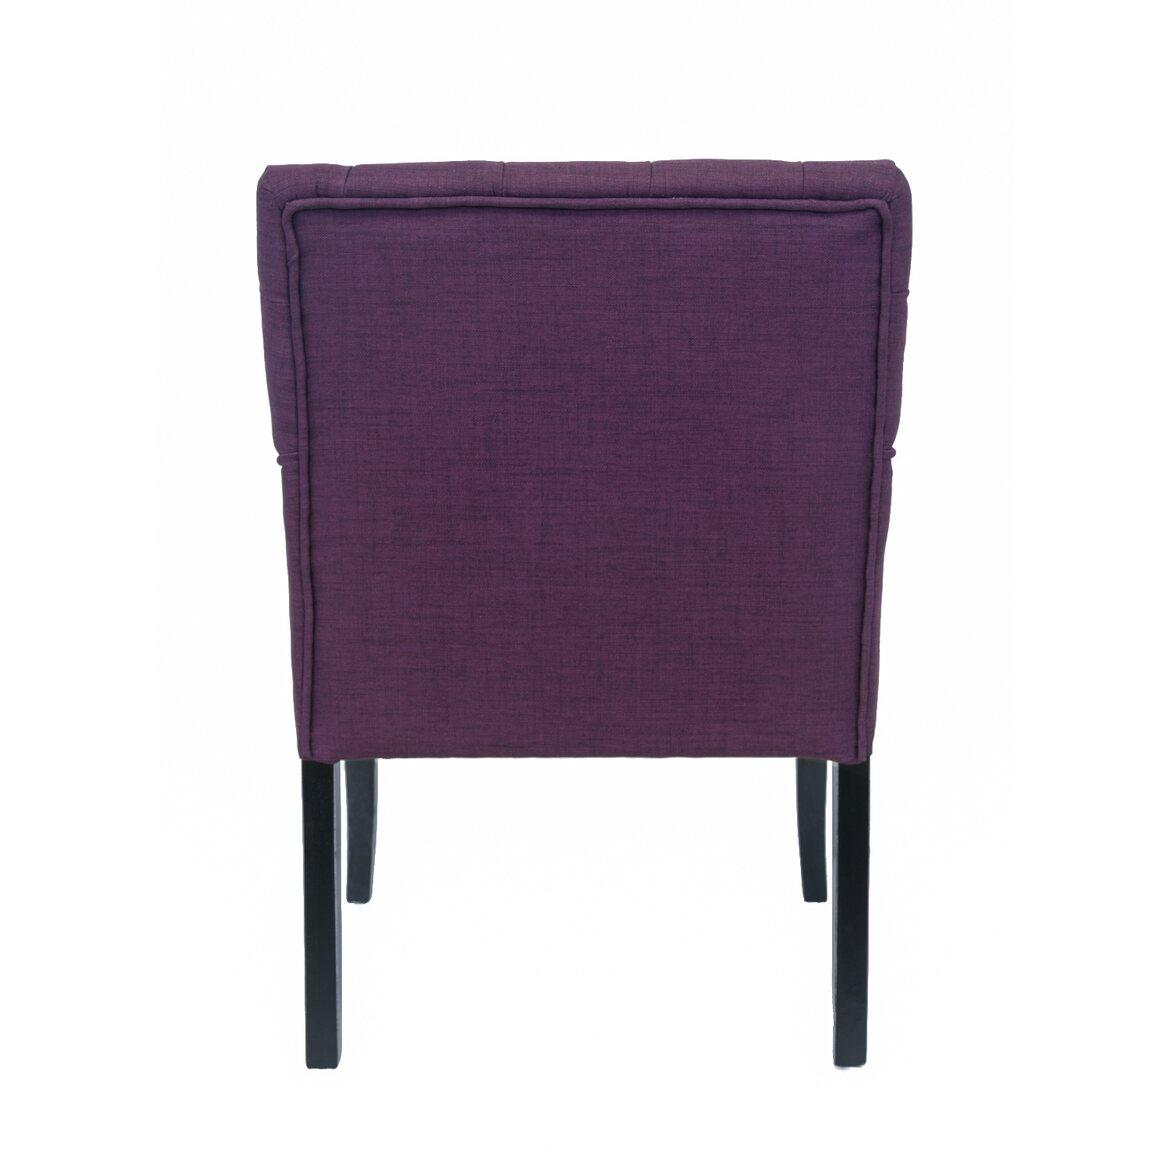 Кресло Zander purple 3 | Кресло-стул Kingsby